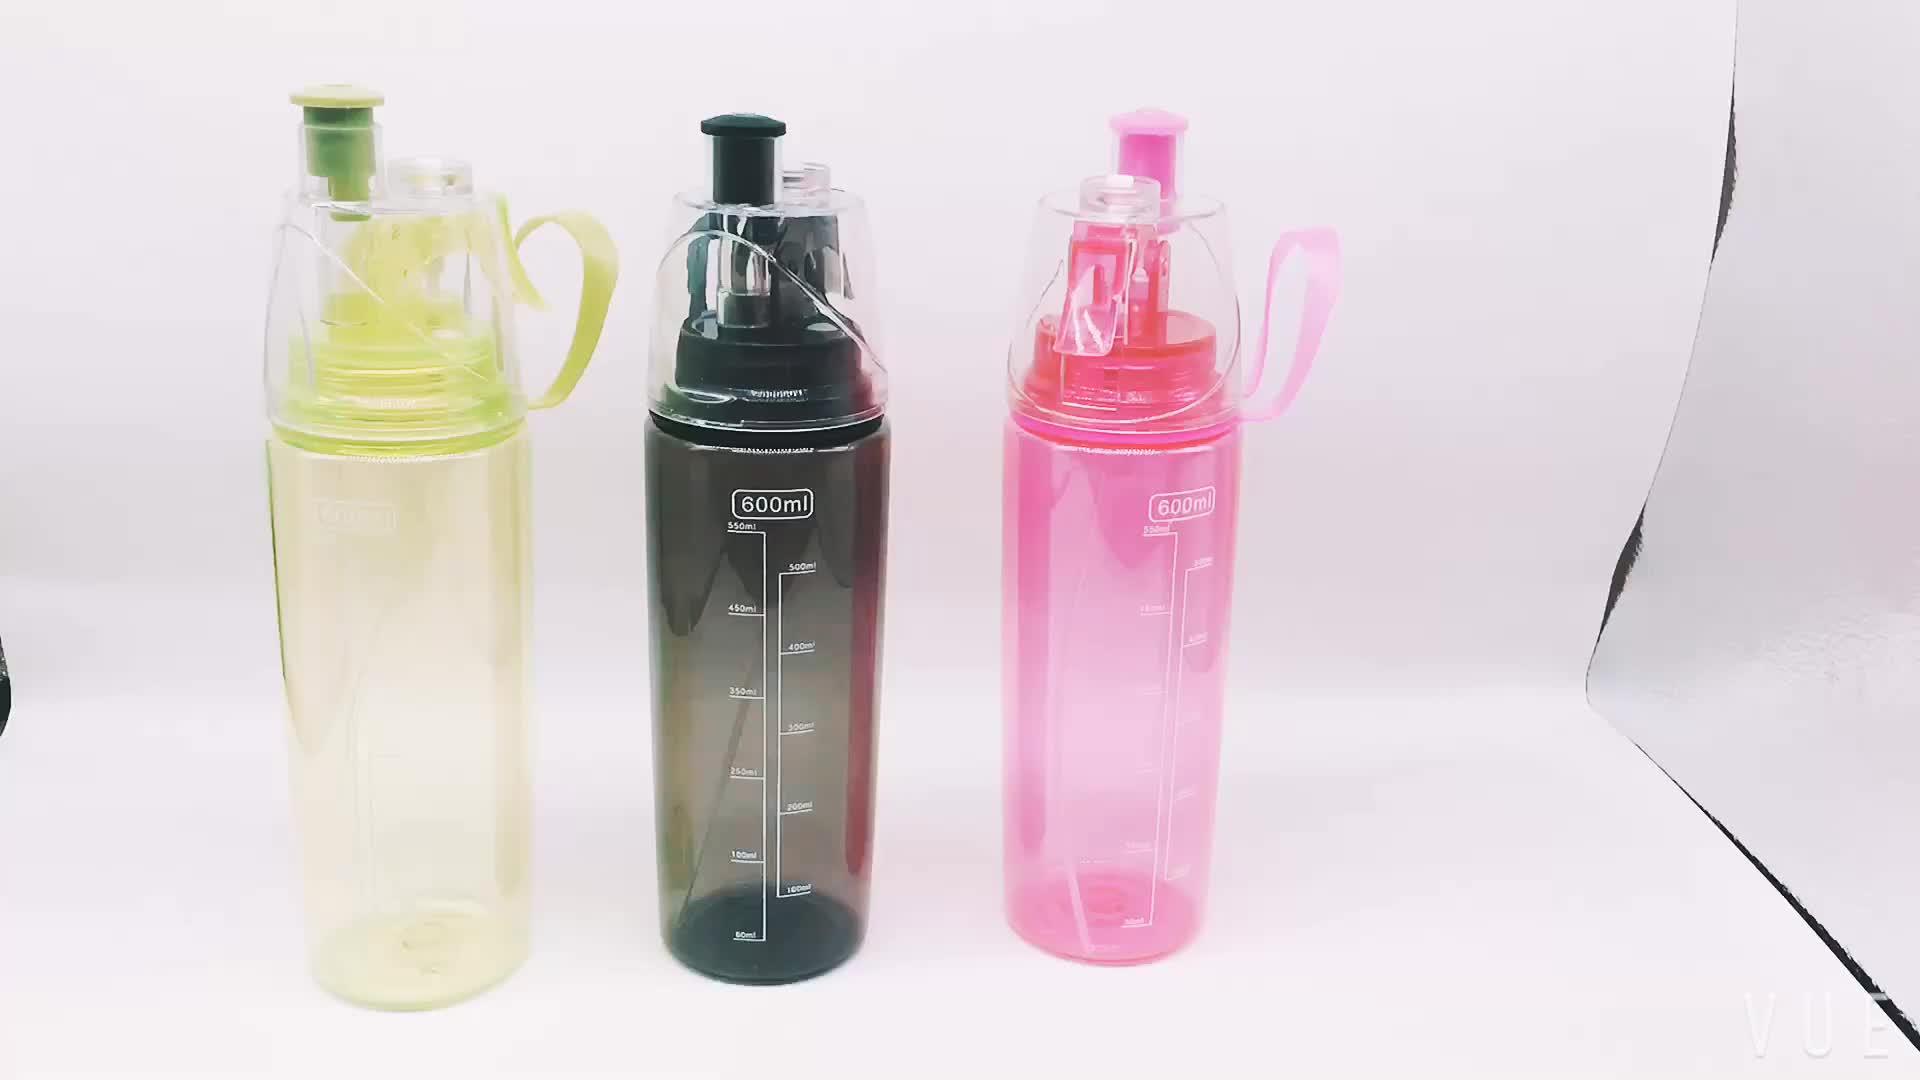 600ml Sport Spray Water Bottle BPA Free Sport Plastic Bottles Moisturizing & Hairdressing Beauty Tools